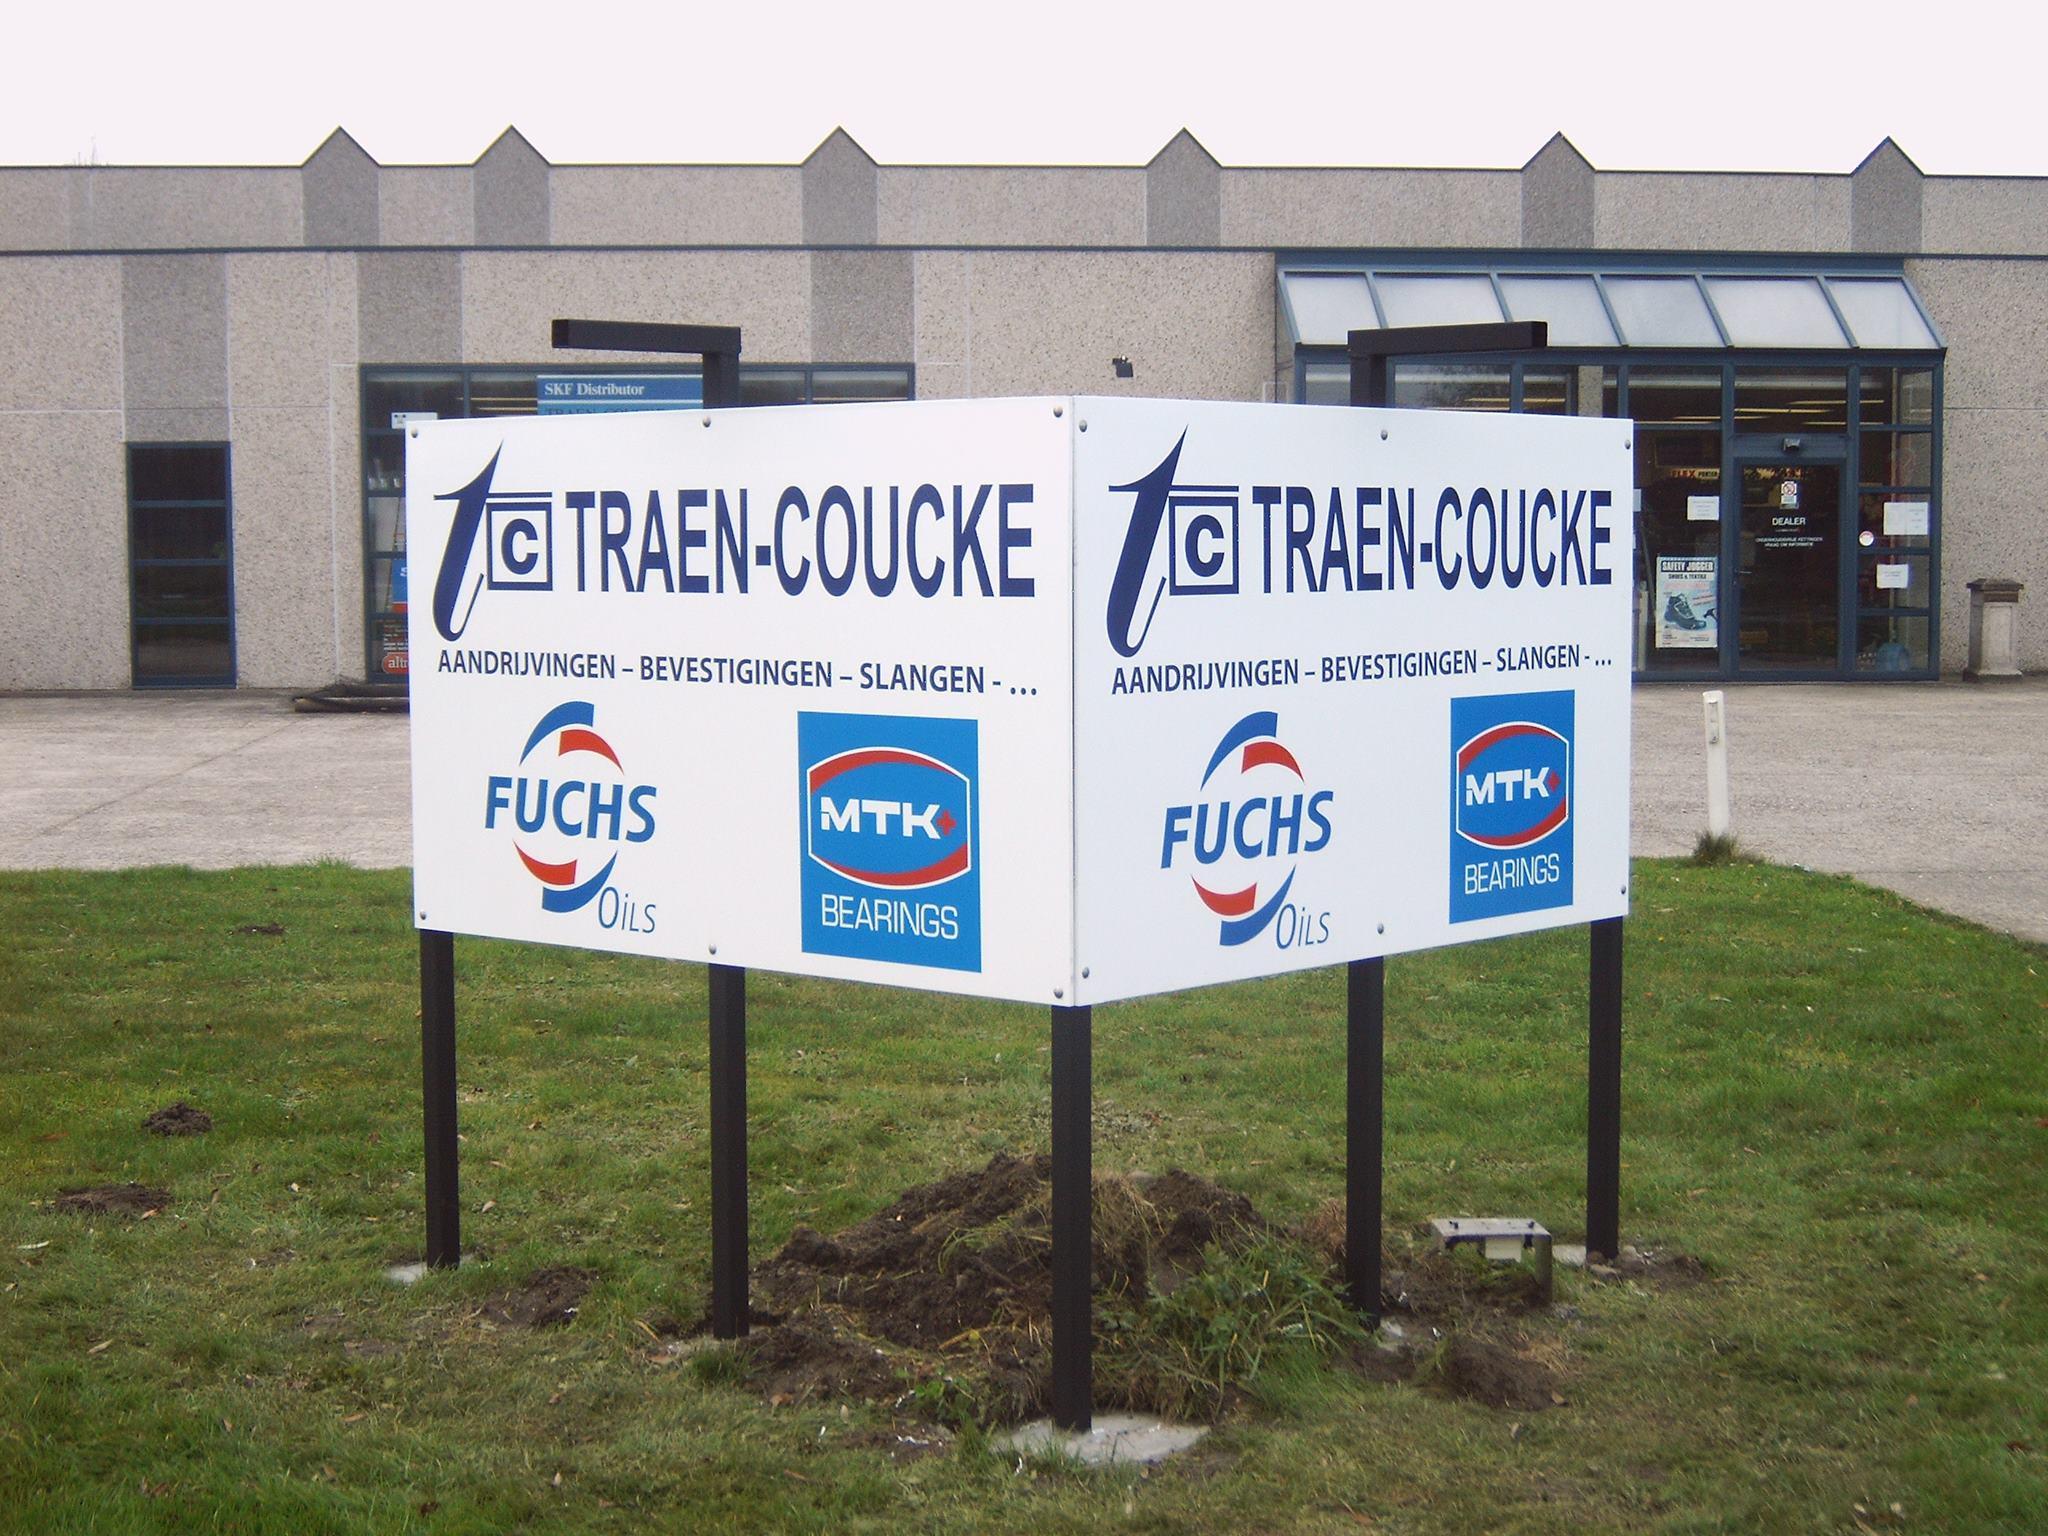 Traen-Coucke